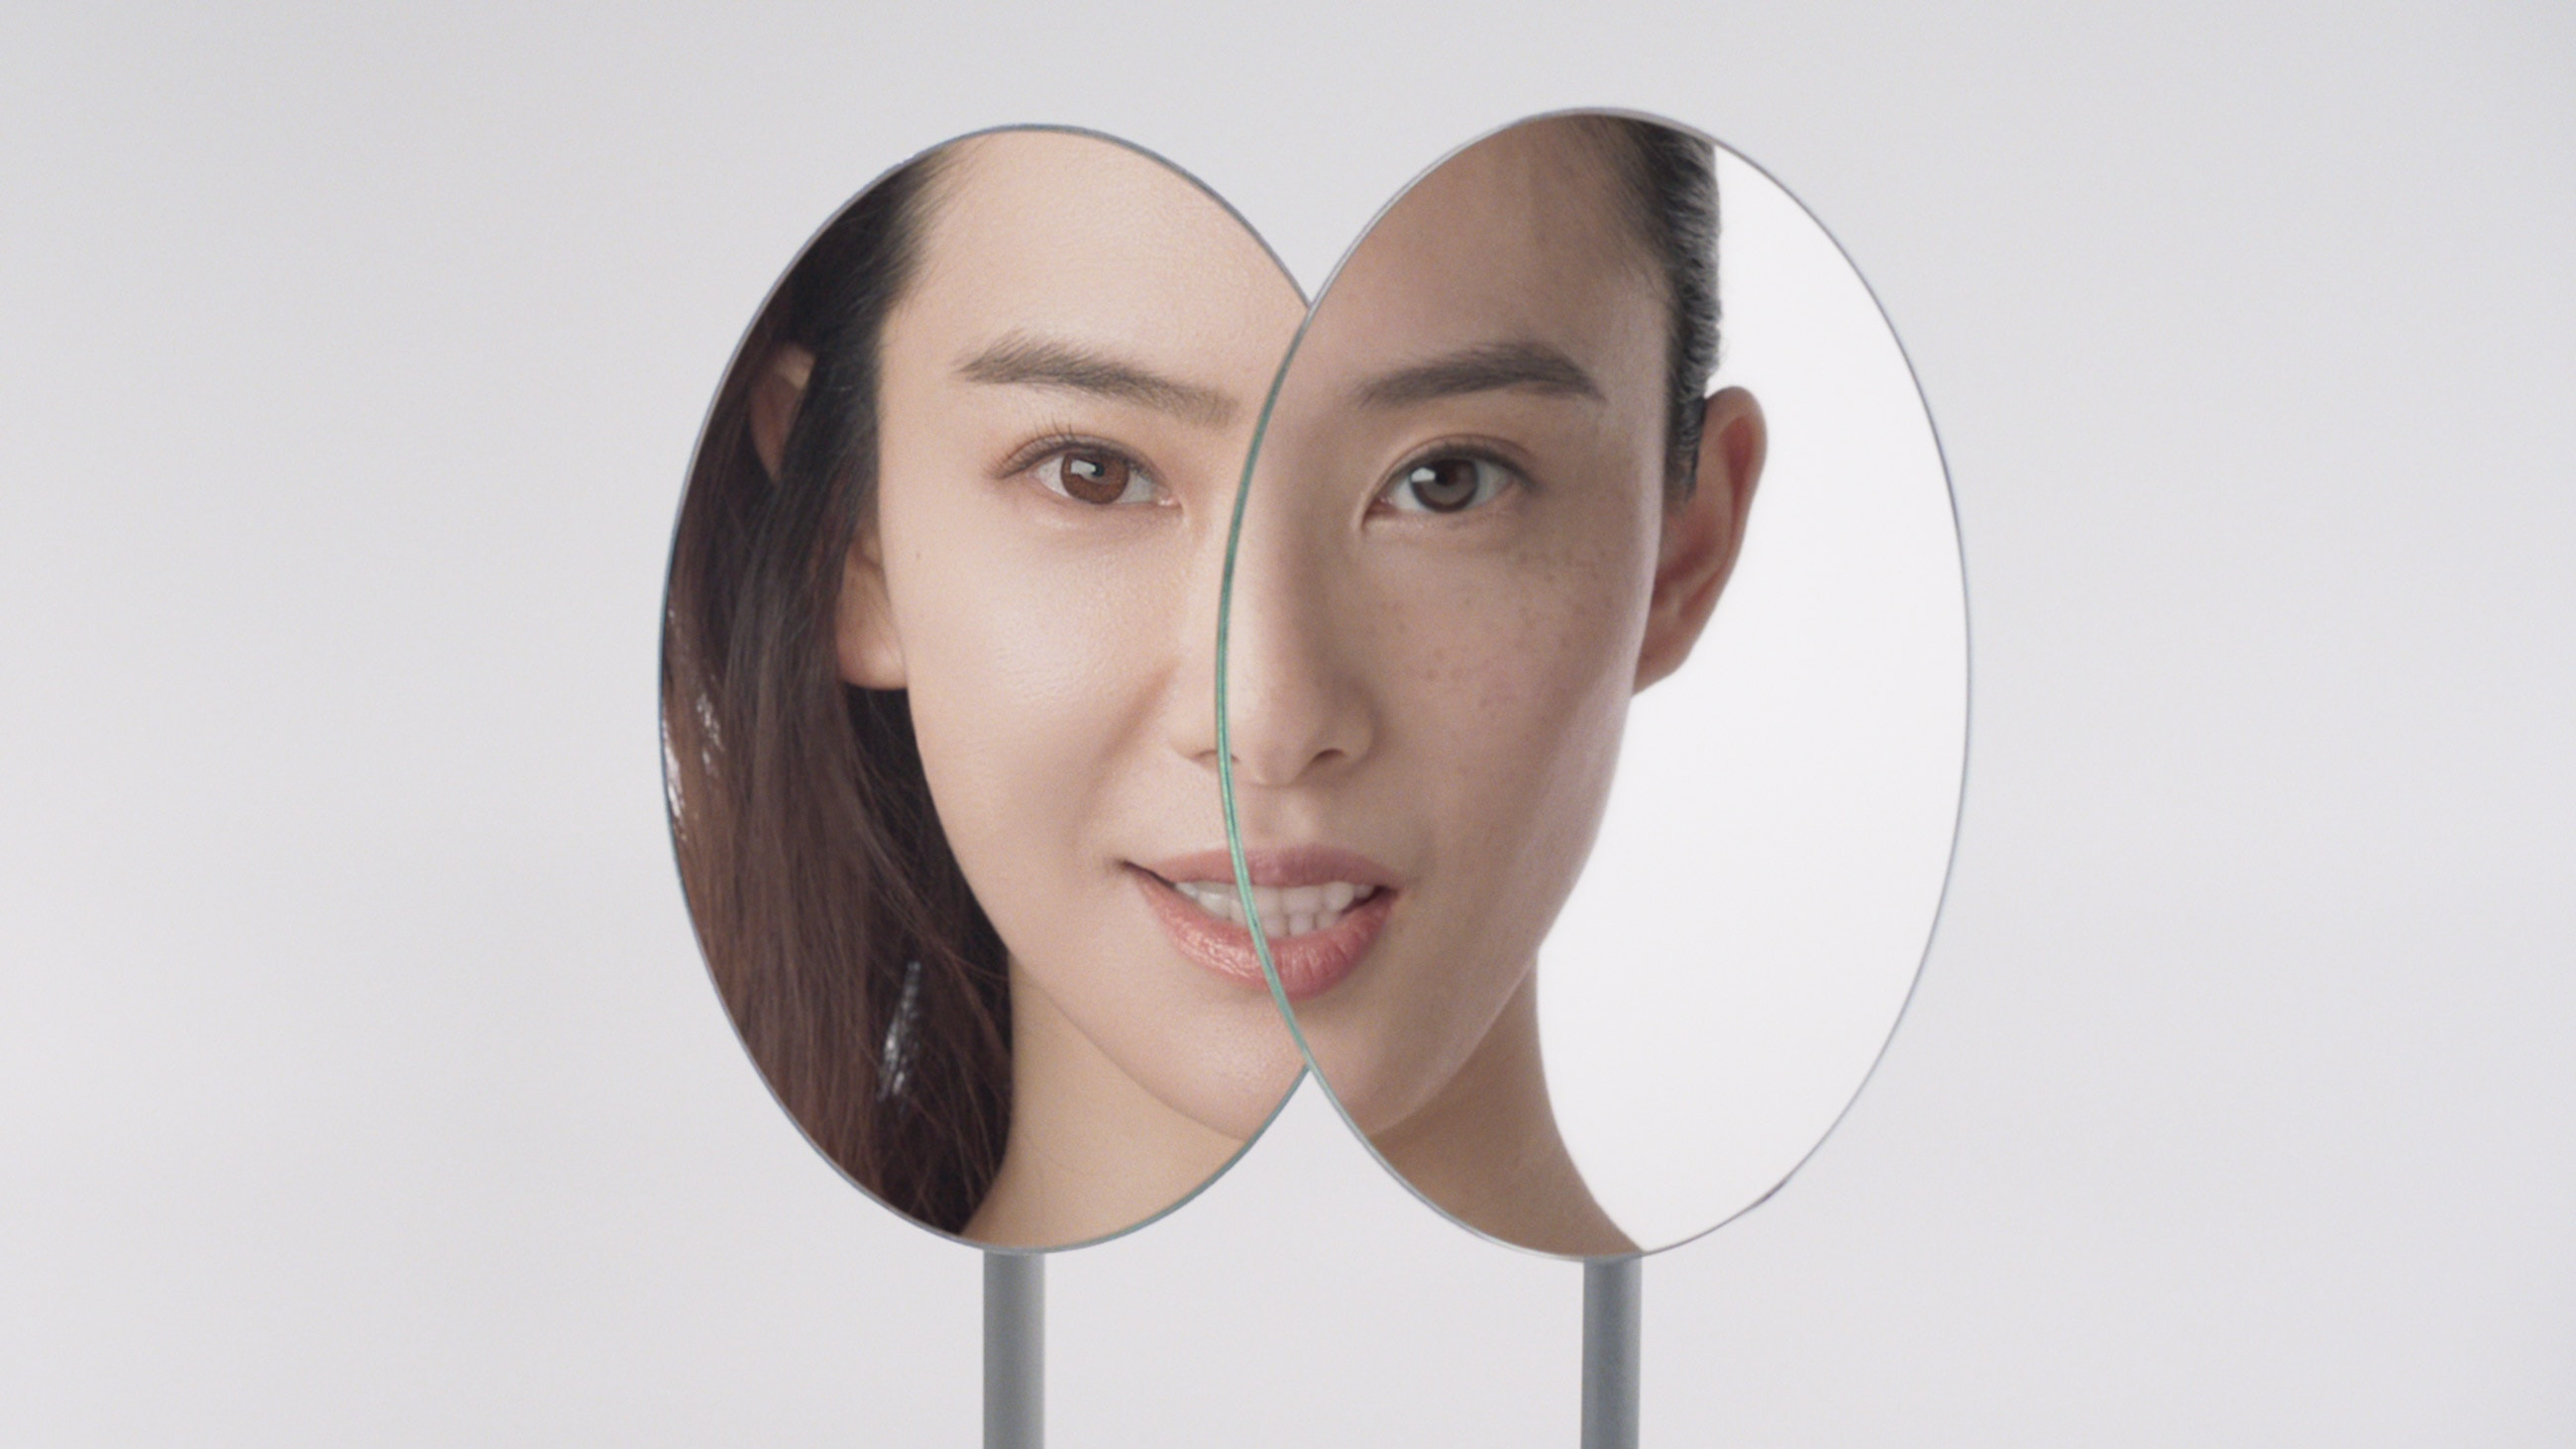 Studio Sander Plug – Clinique - Mirror